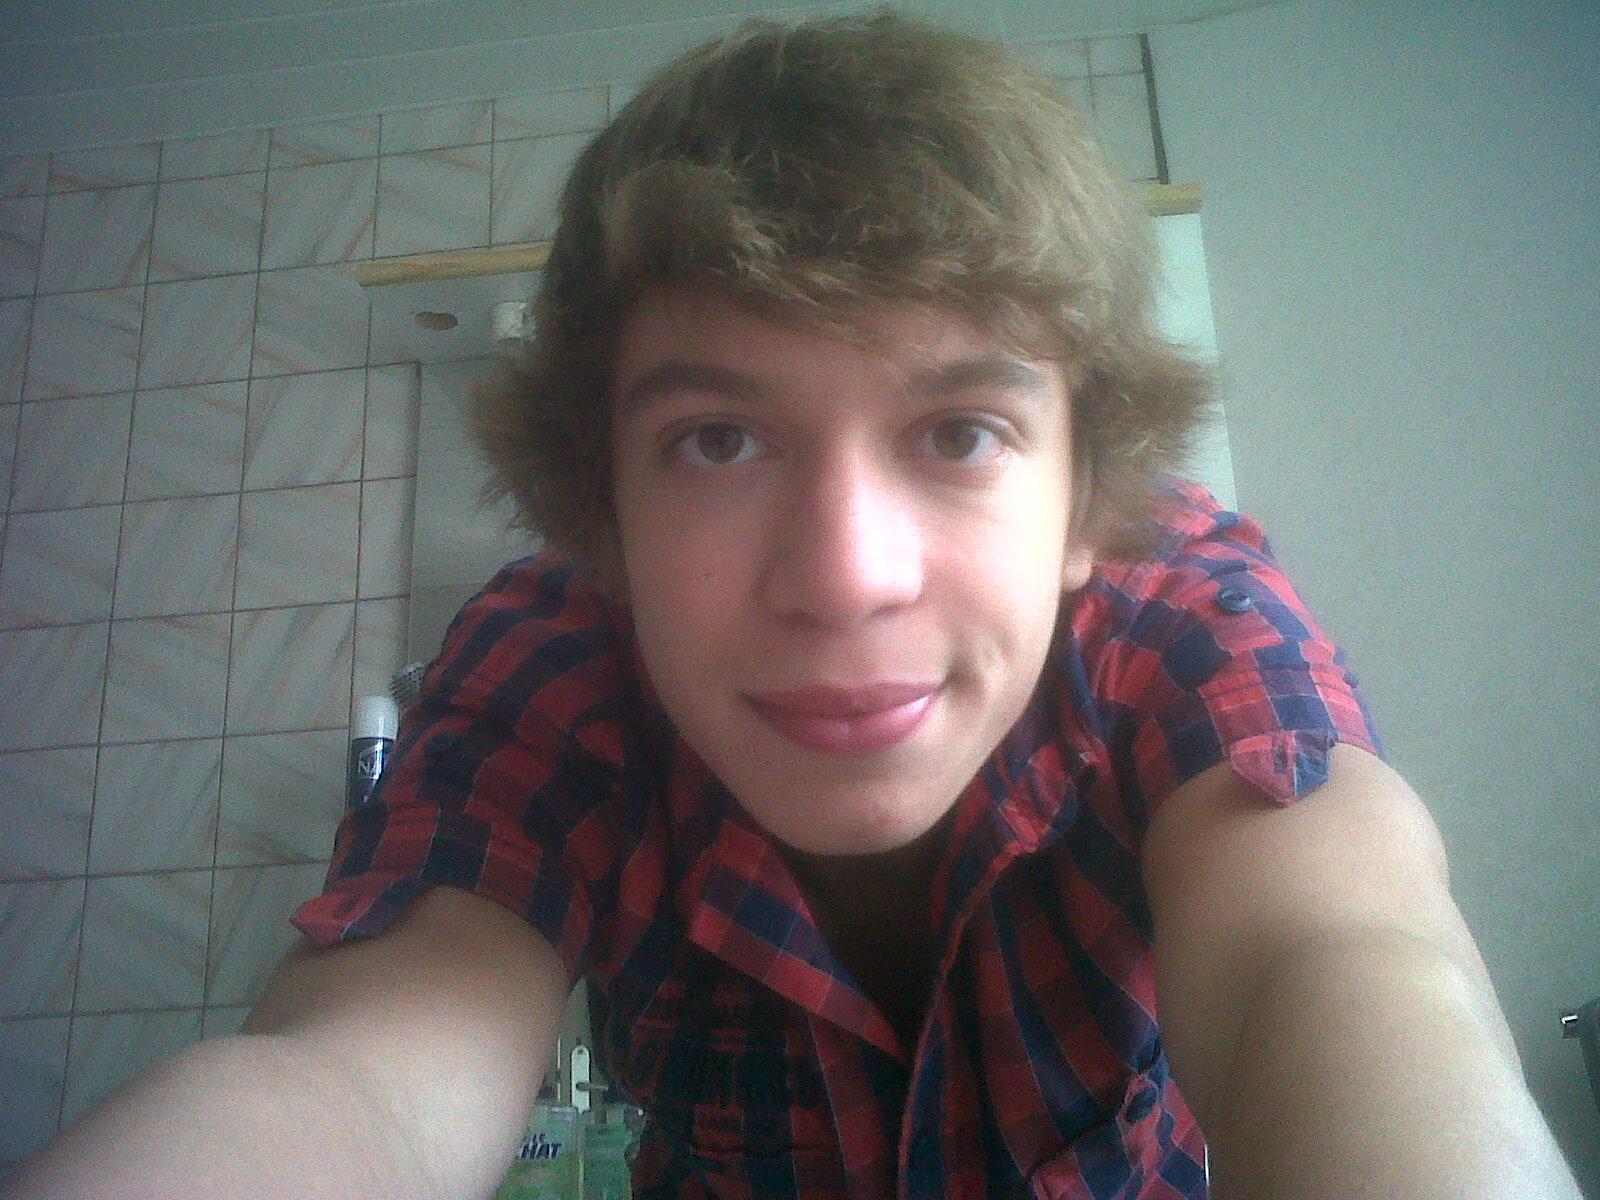 Moi sans maquillage  http//image.noelshack.com/fichiers/2012/43/